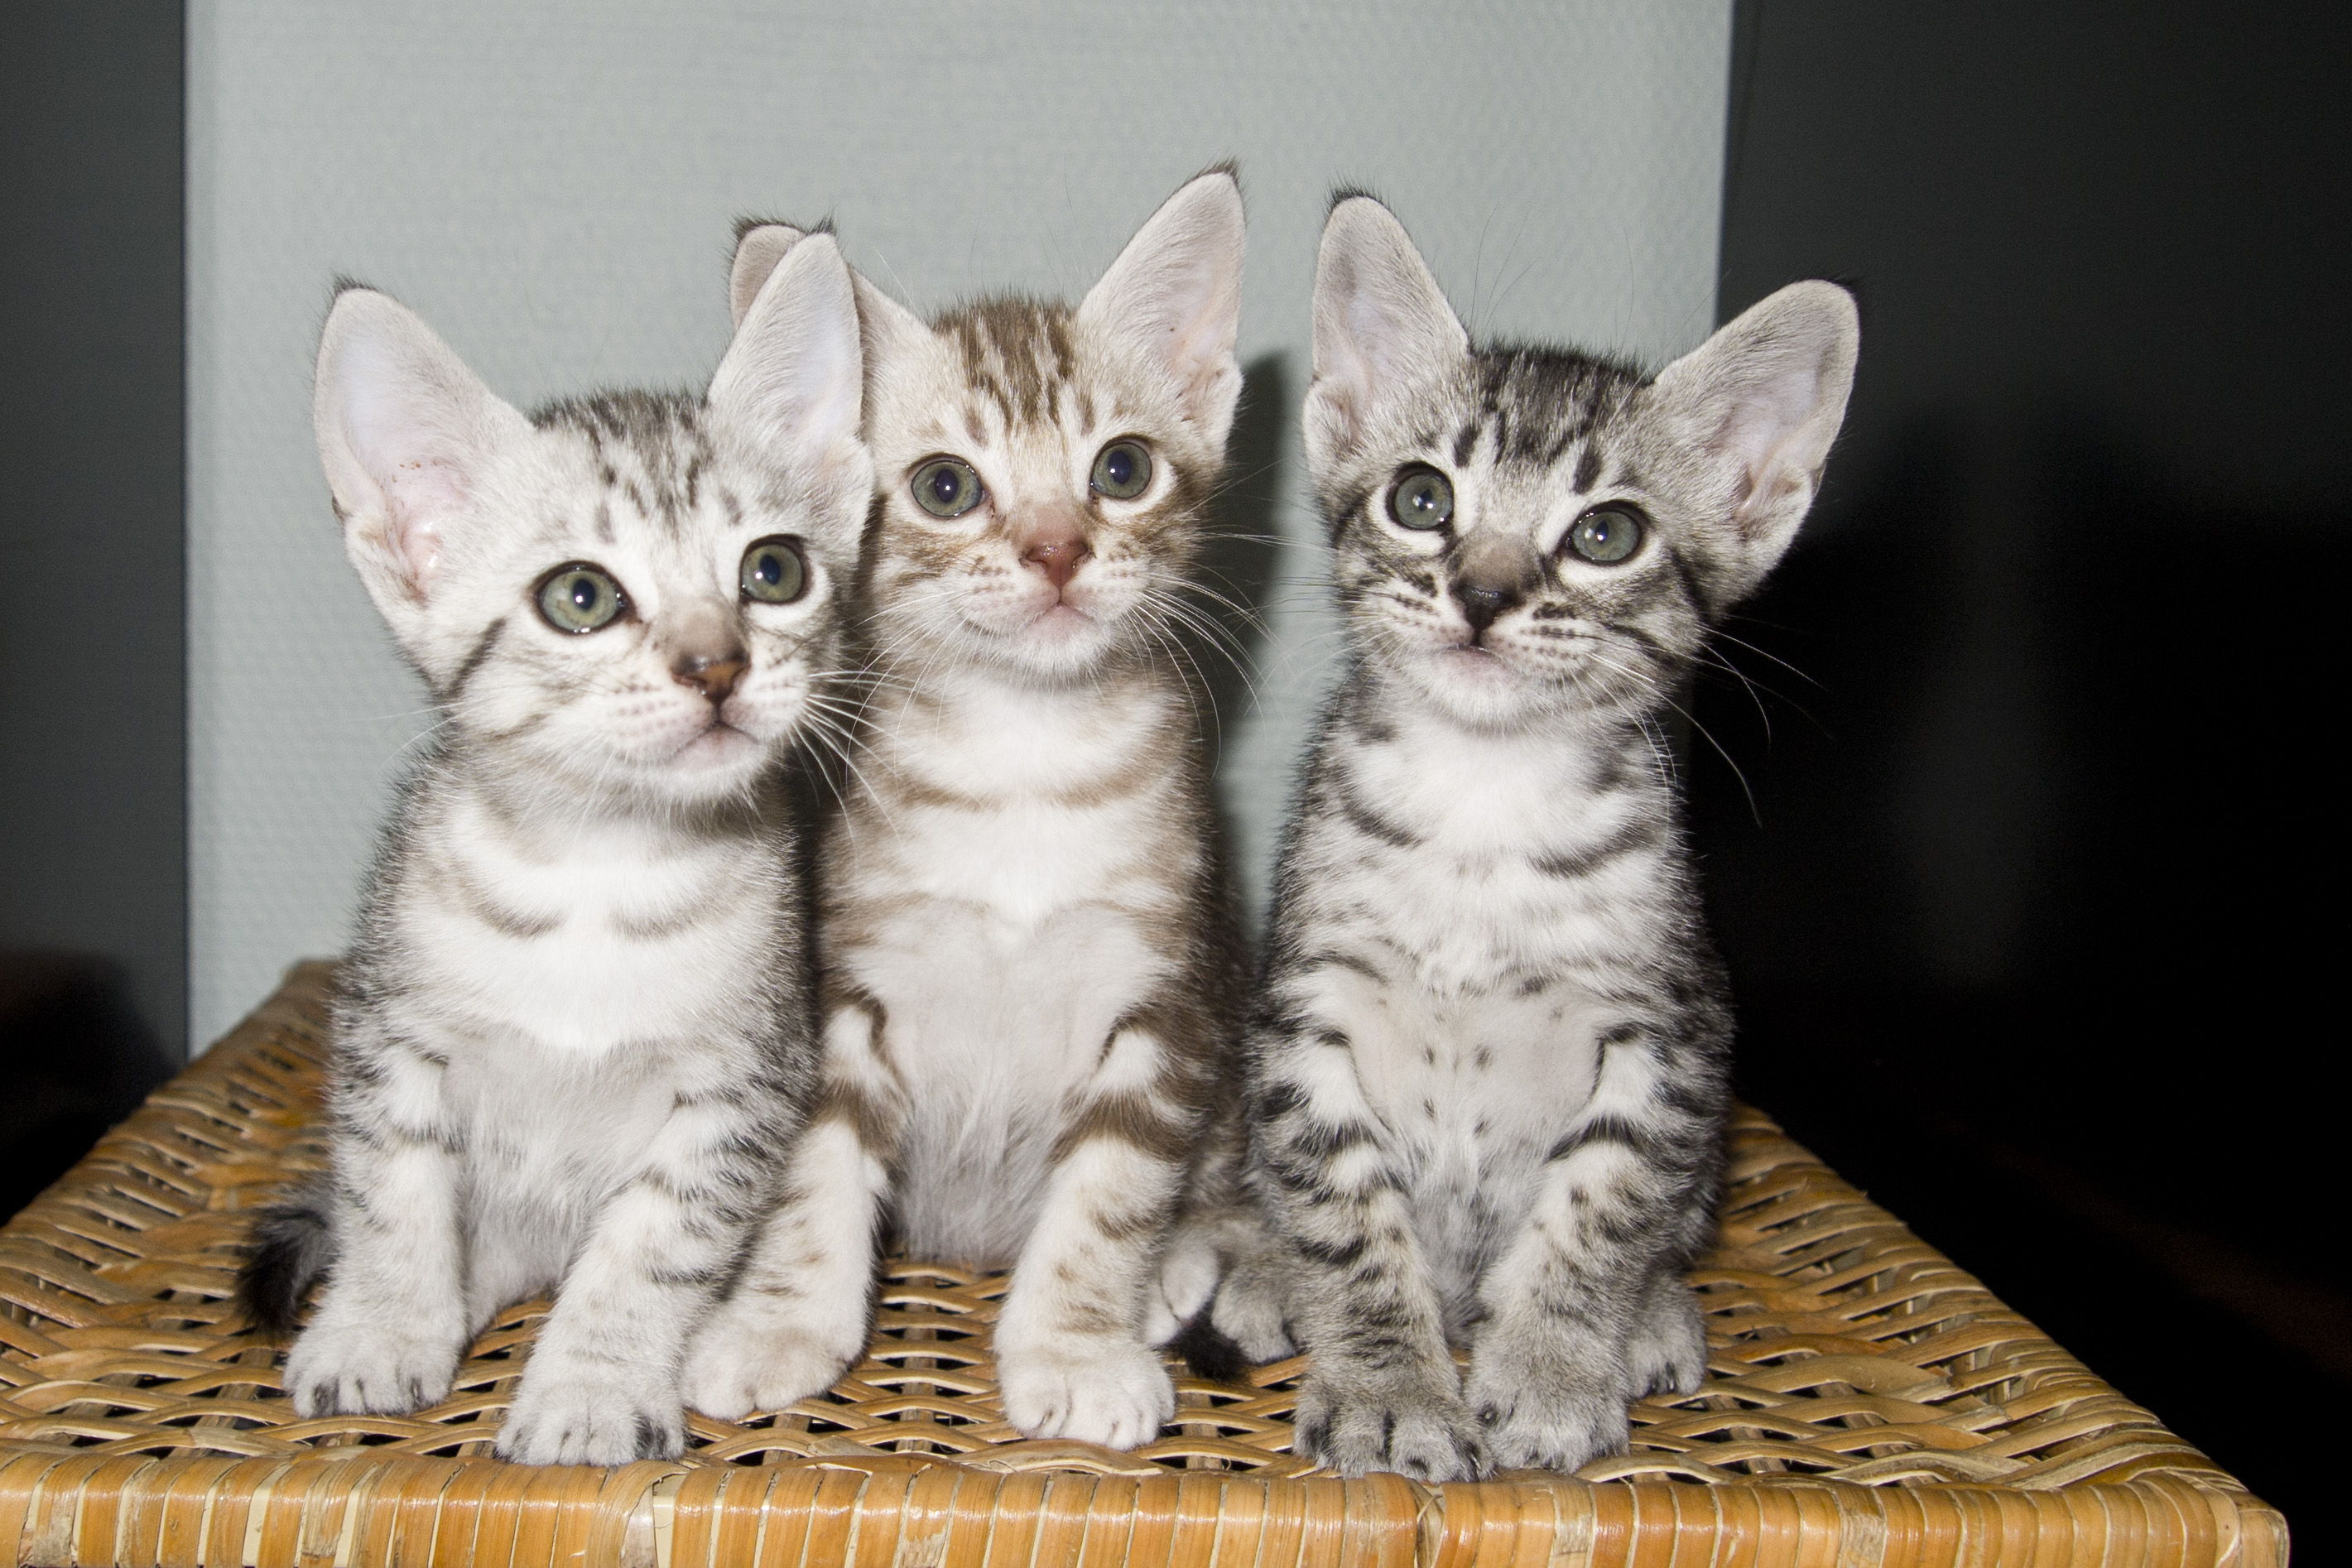 Cute Ocicat kittens wallpaper